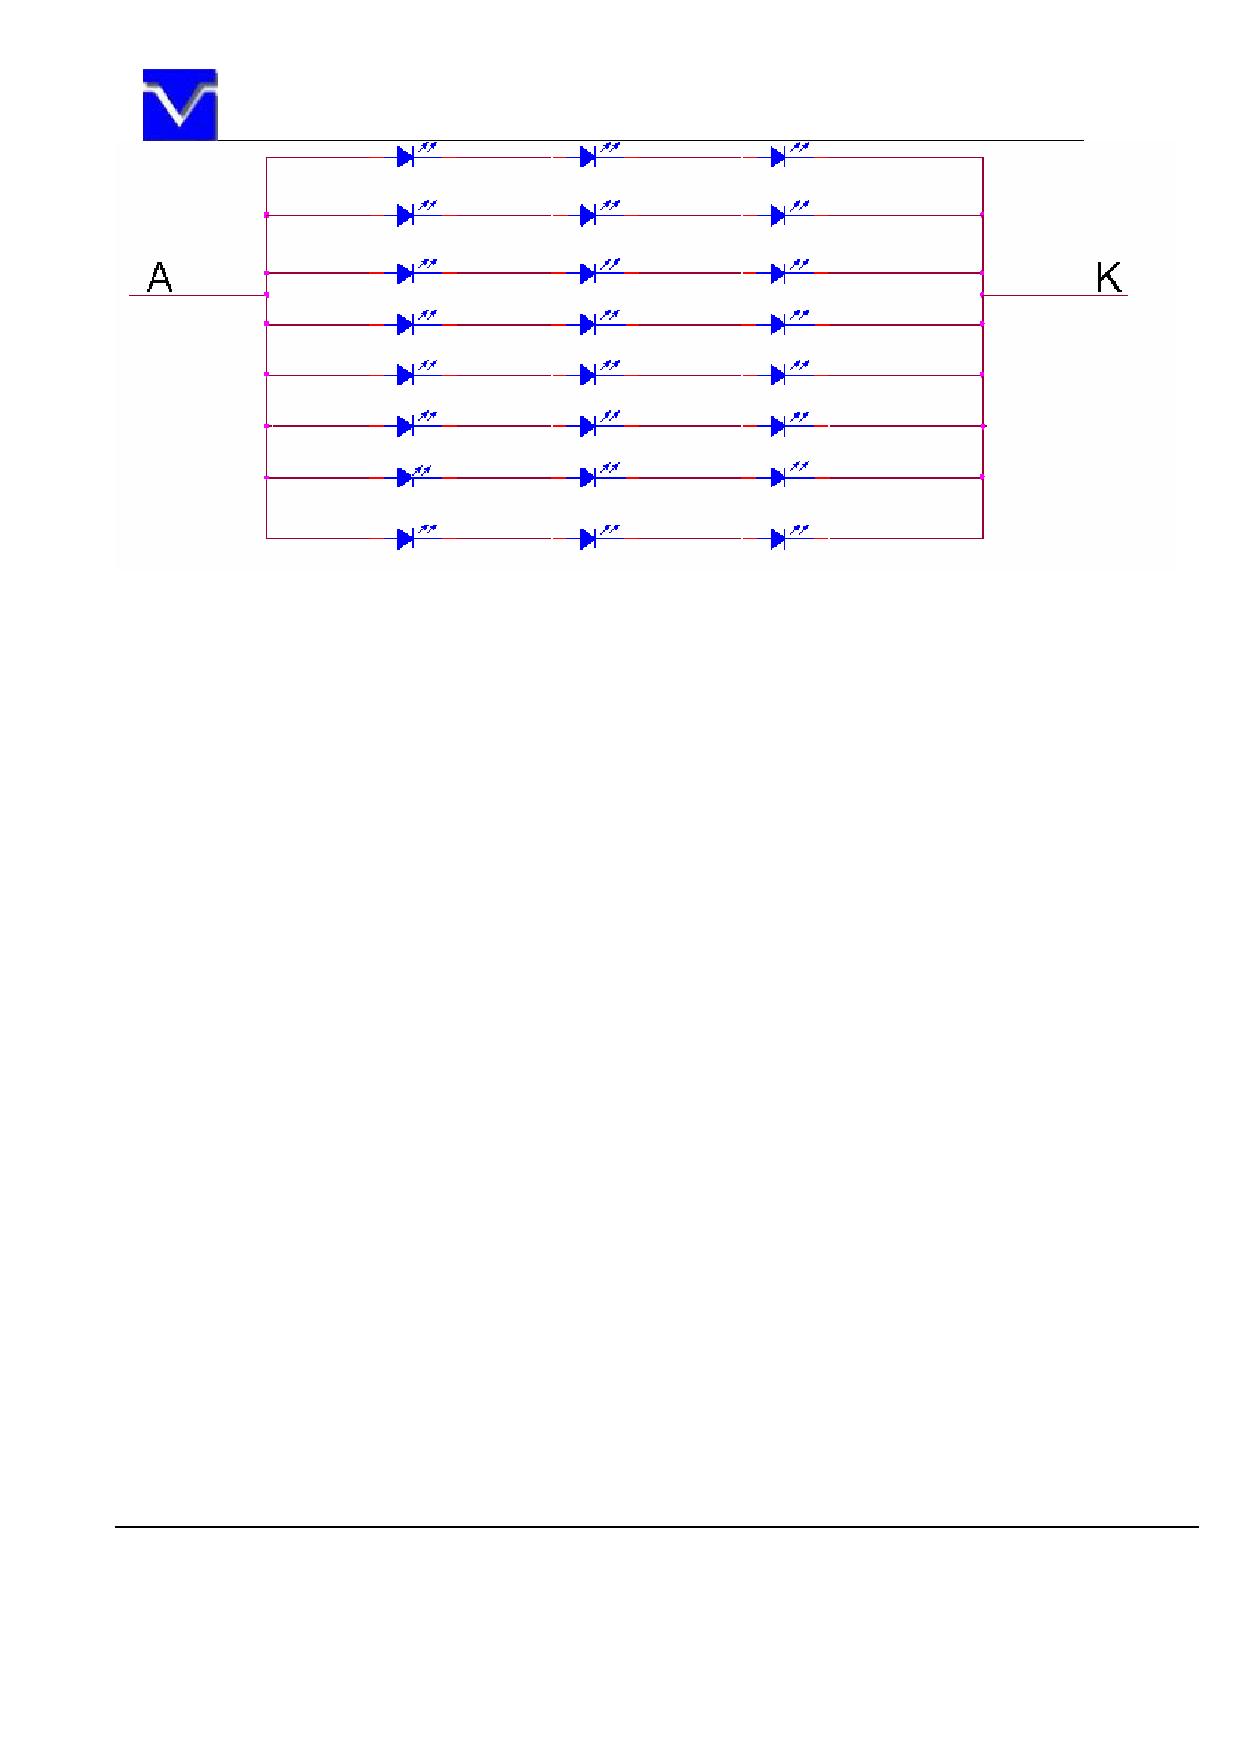 TM101XDH01 diode, scr